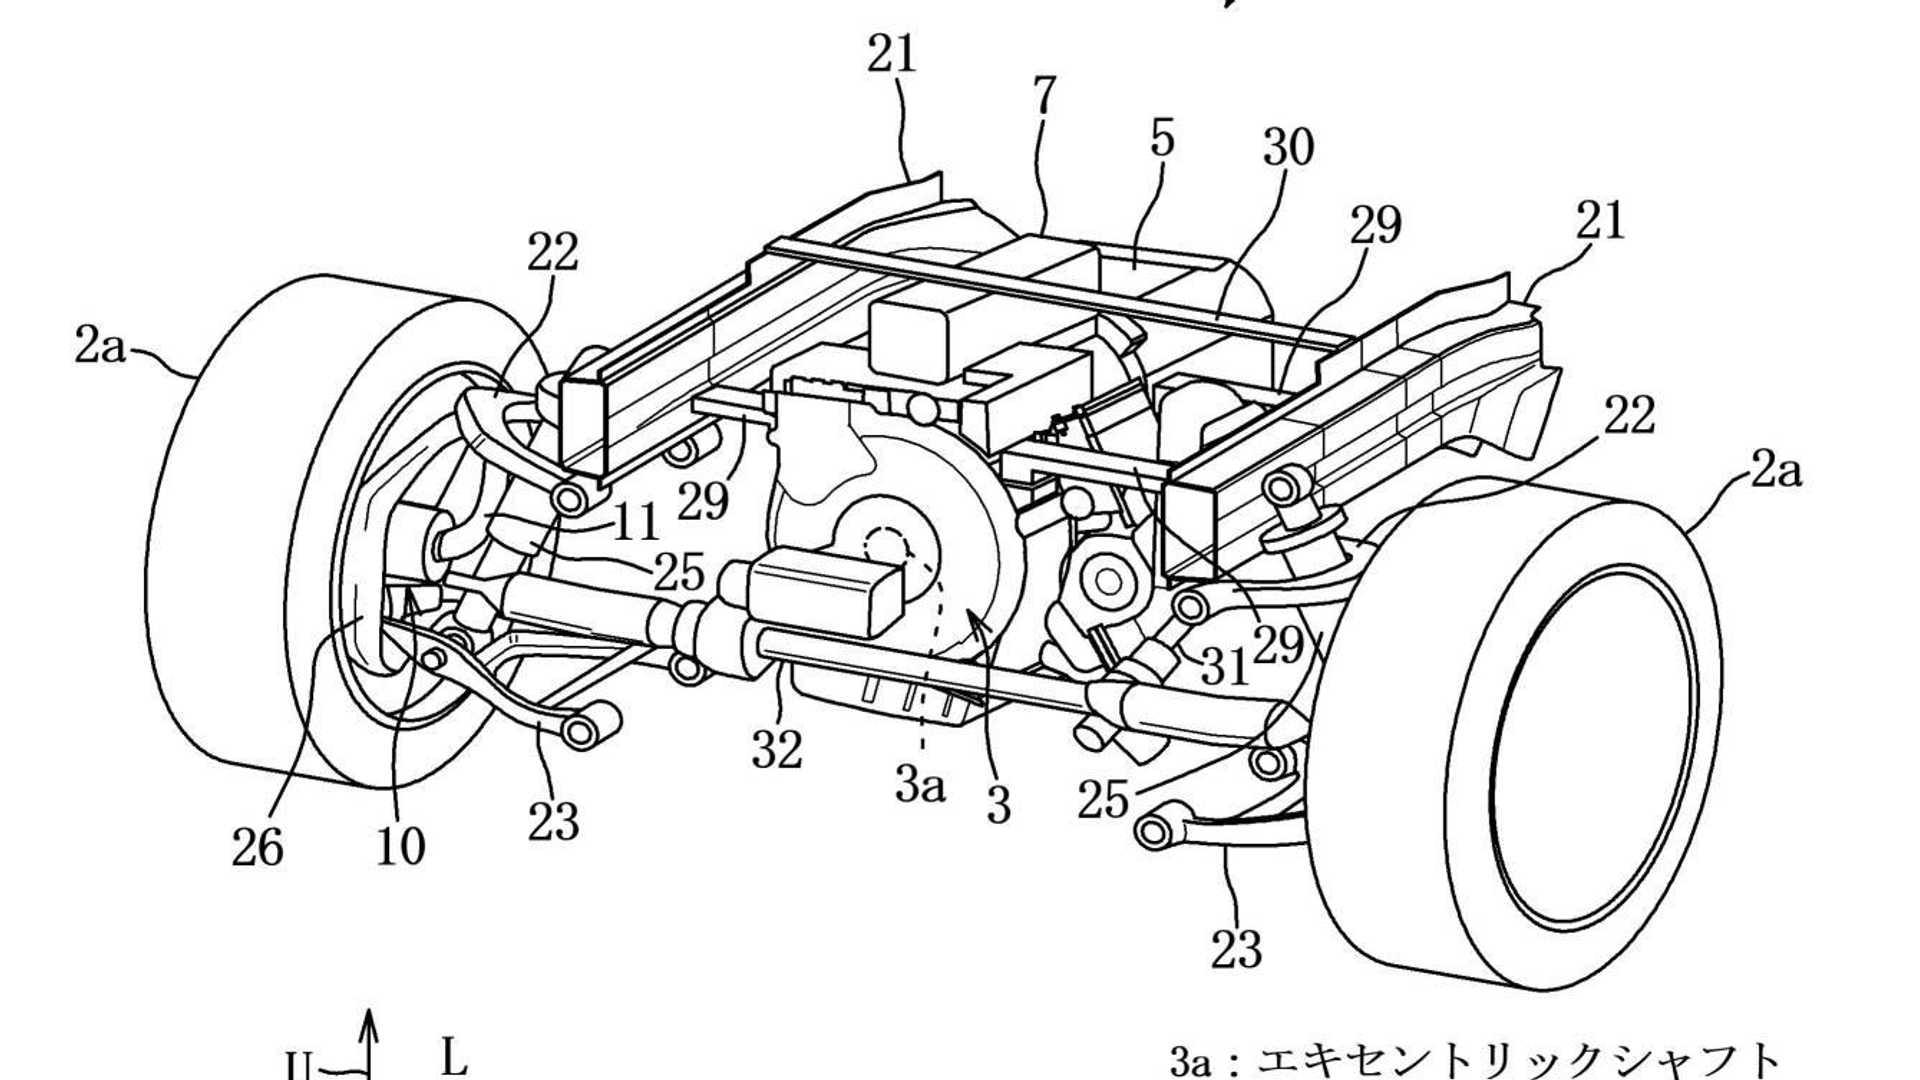 Mazda-Rotary-Engine-Hybrid-Patent-1